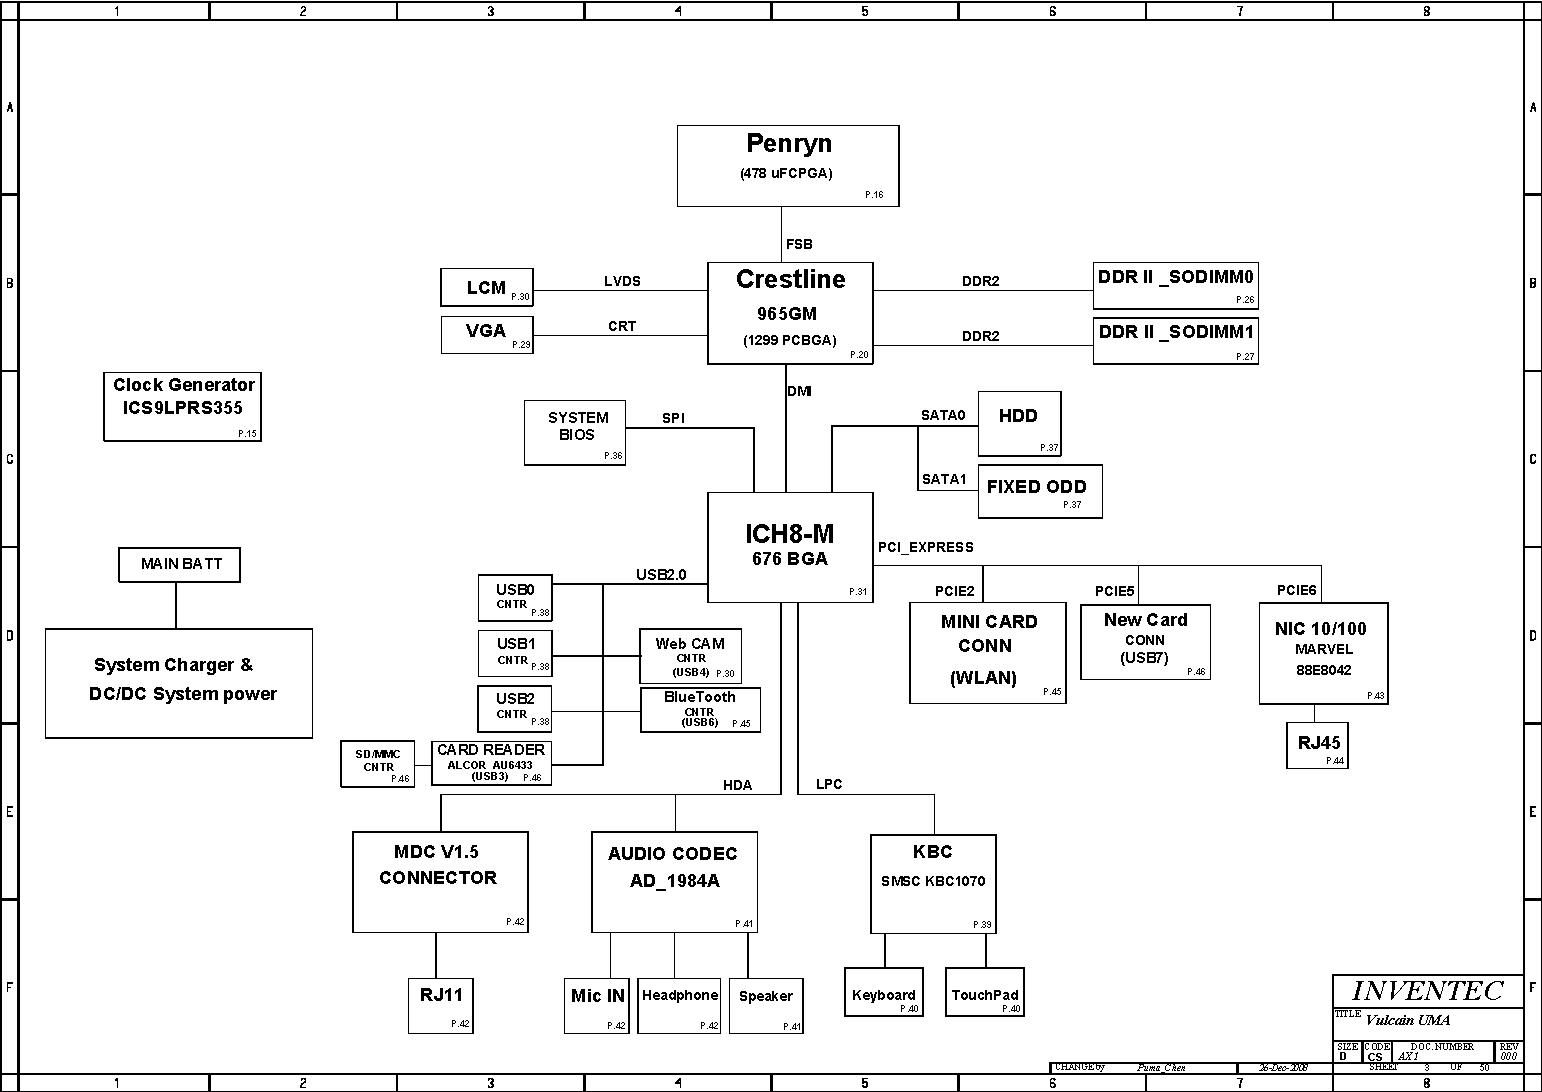 hight resolution of the motherboard schematic diagram for hp compaq 510 hp compaq 511 hp compaq 610 uma notebook laptop cpu penryn north bridge crestline 965gm